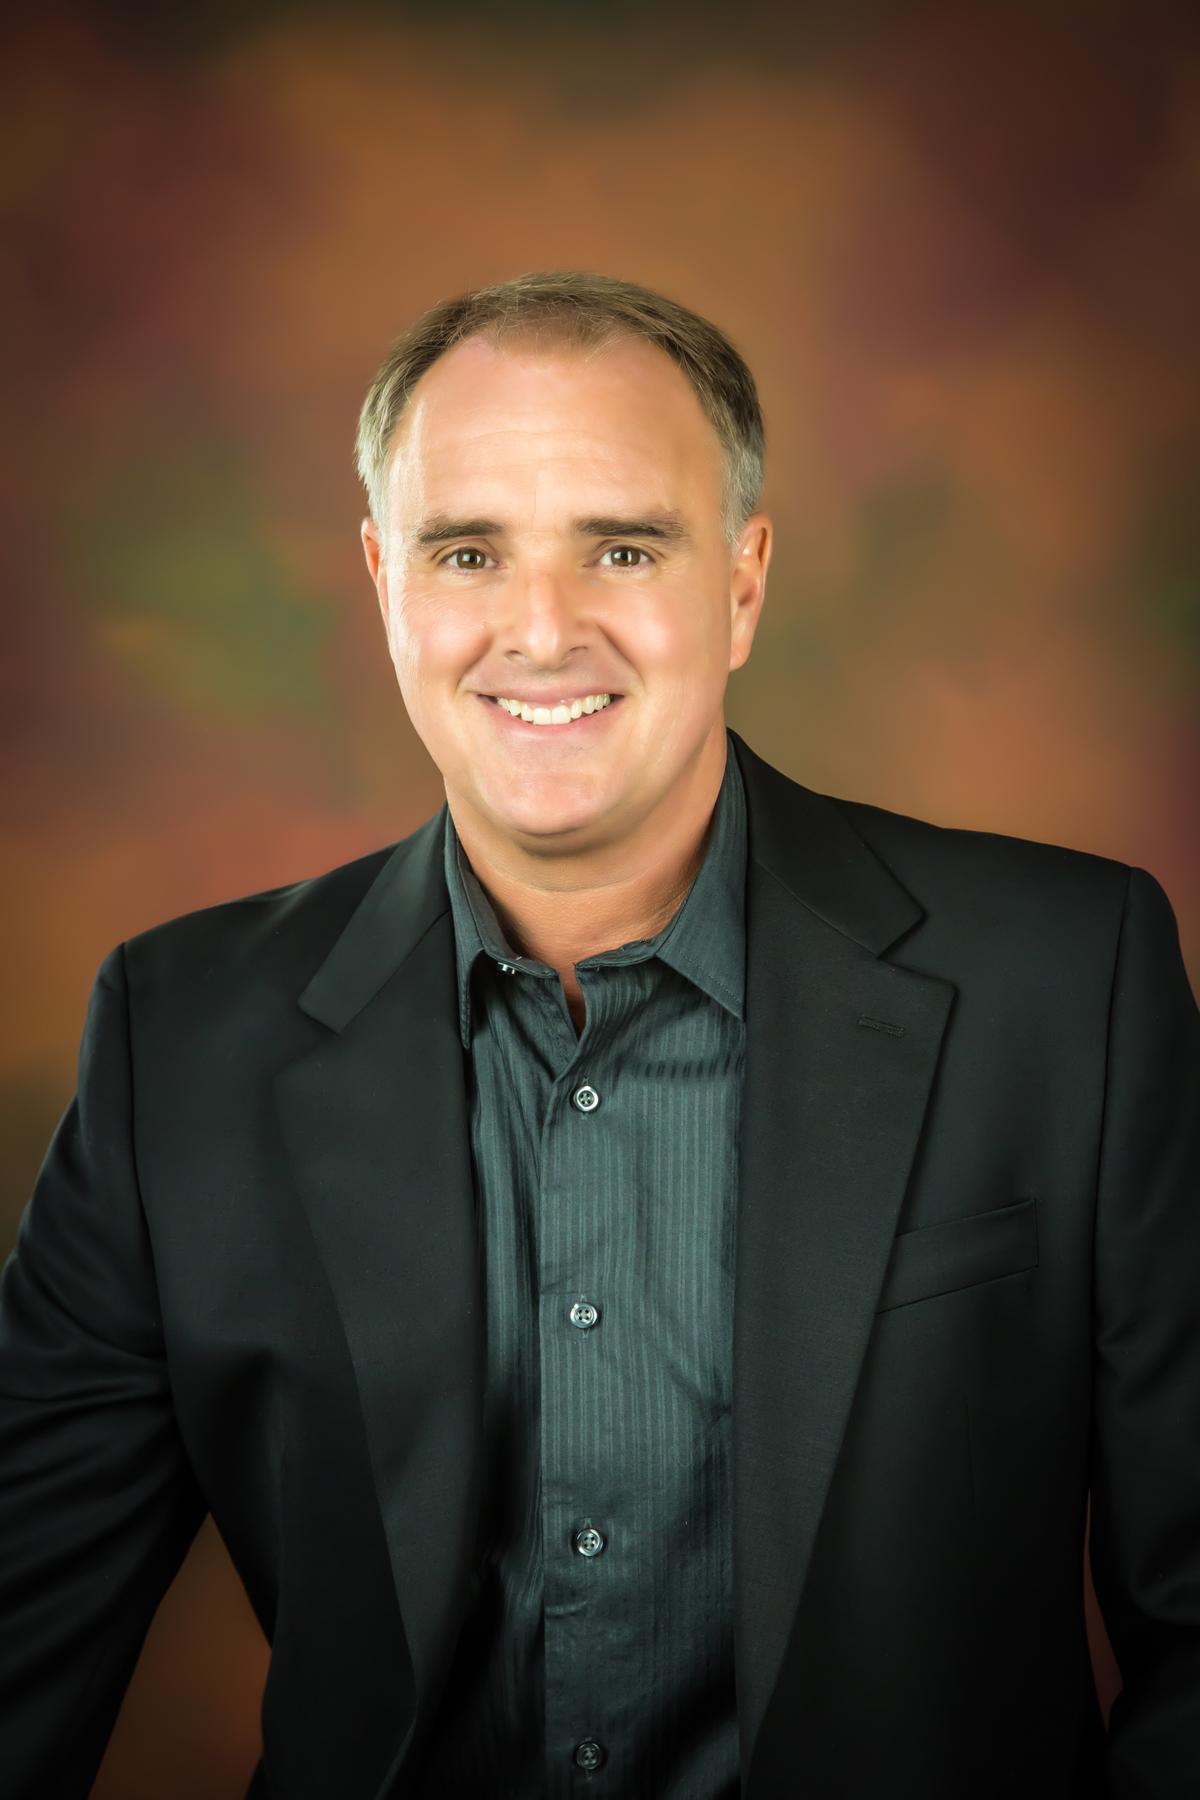 Robert Floyd of Horry County